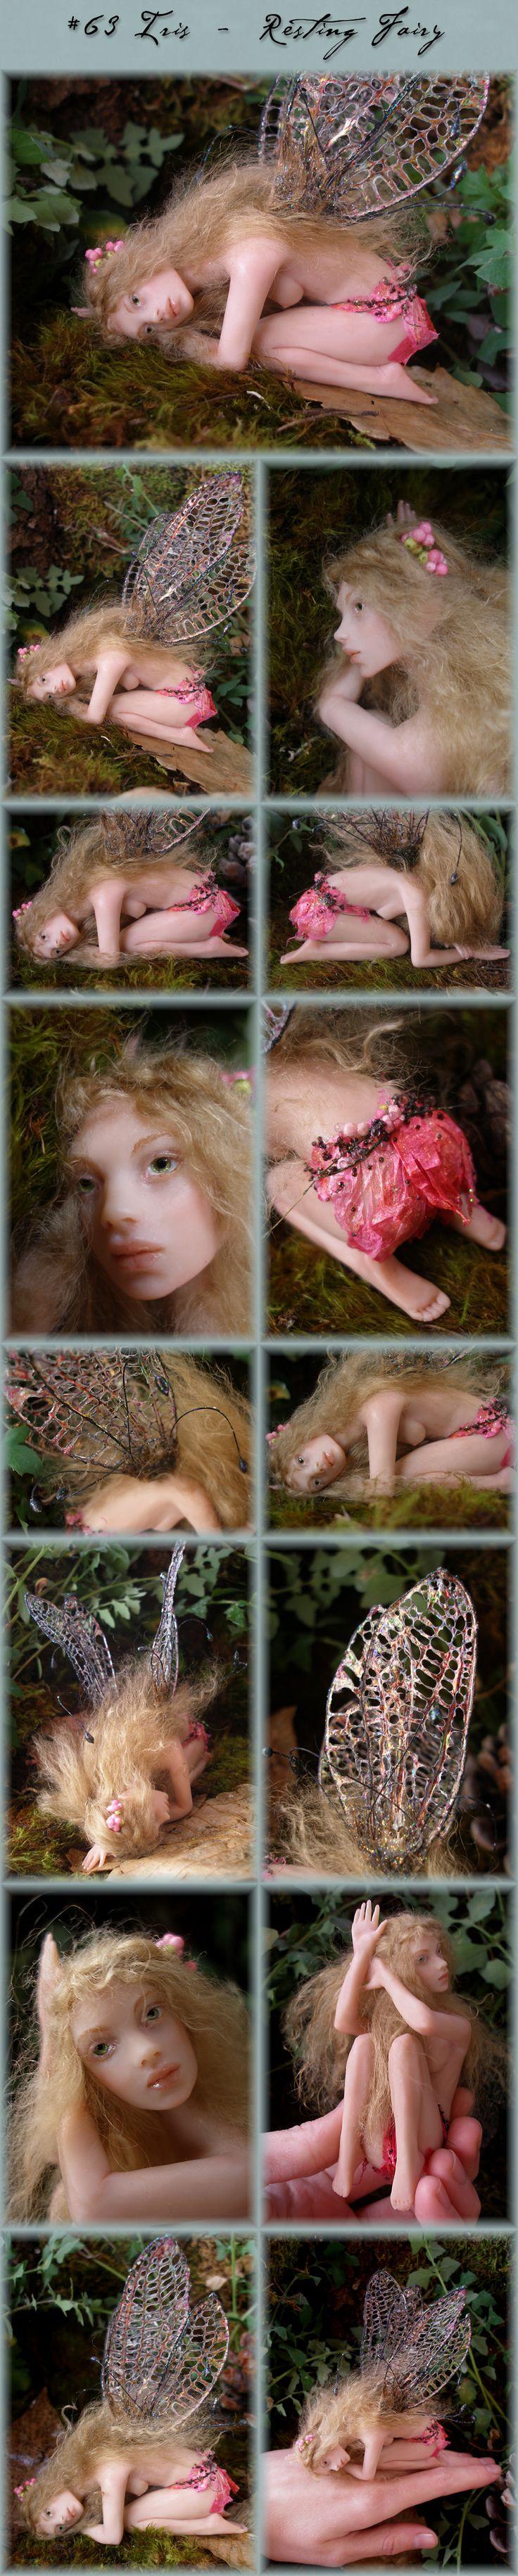 Nenúfar Blanco ~ #63 Iris - Resting Fairy